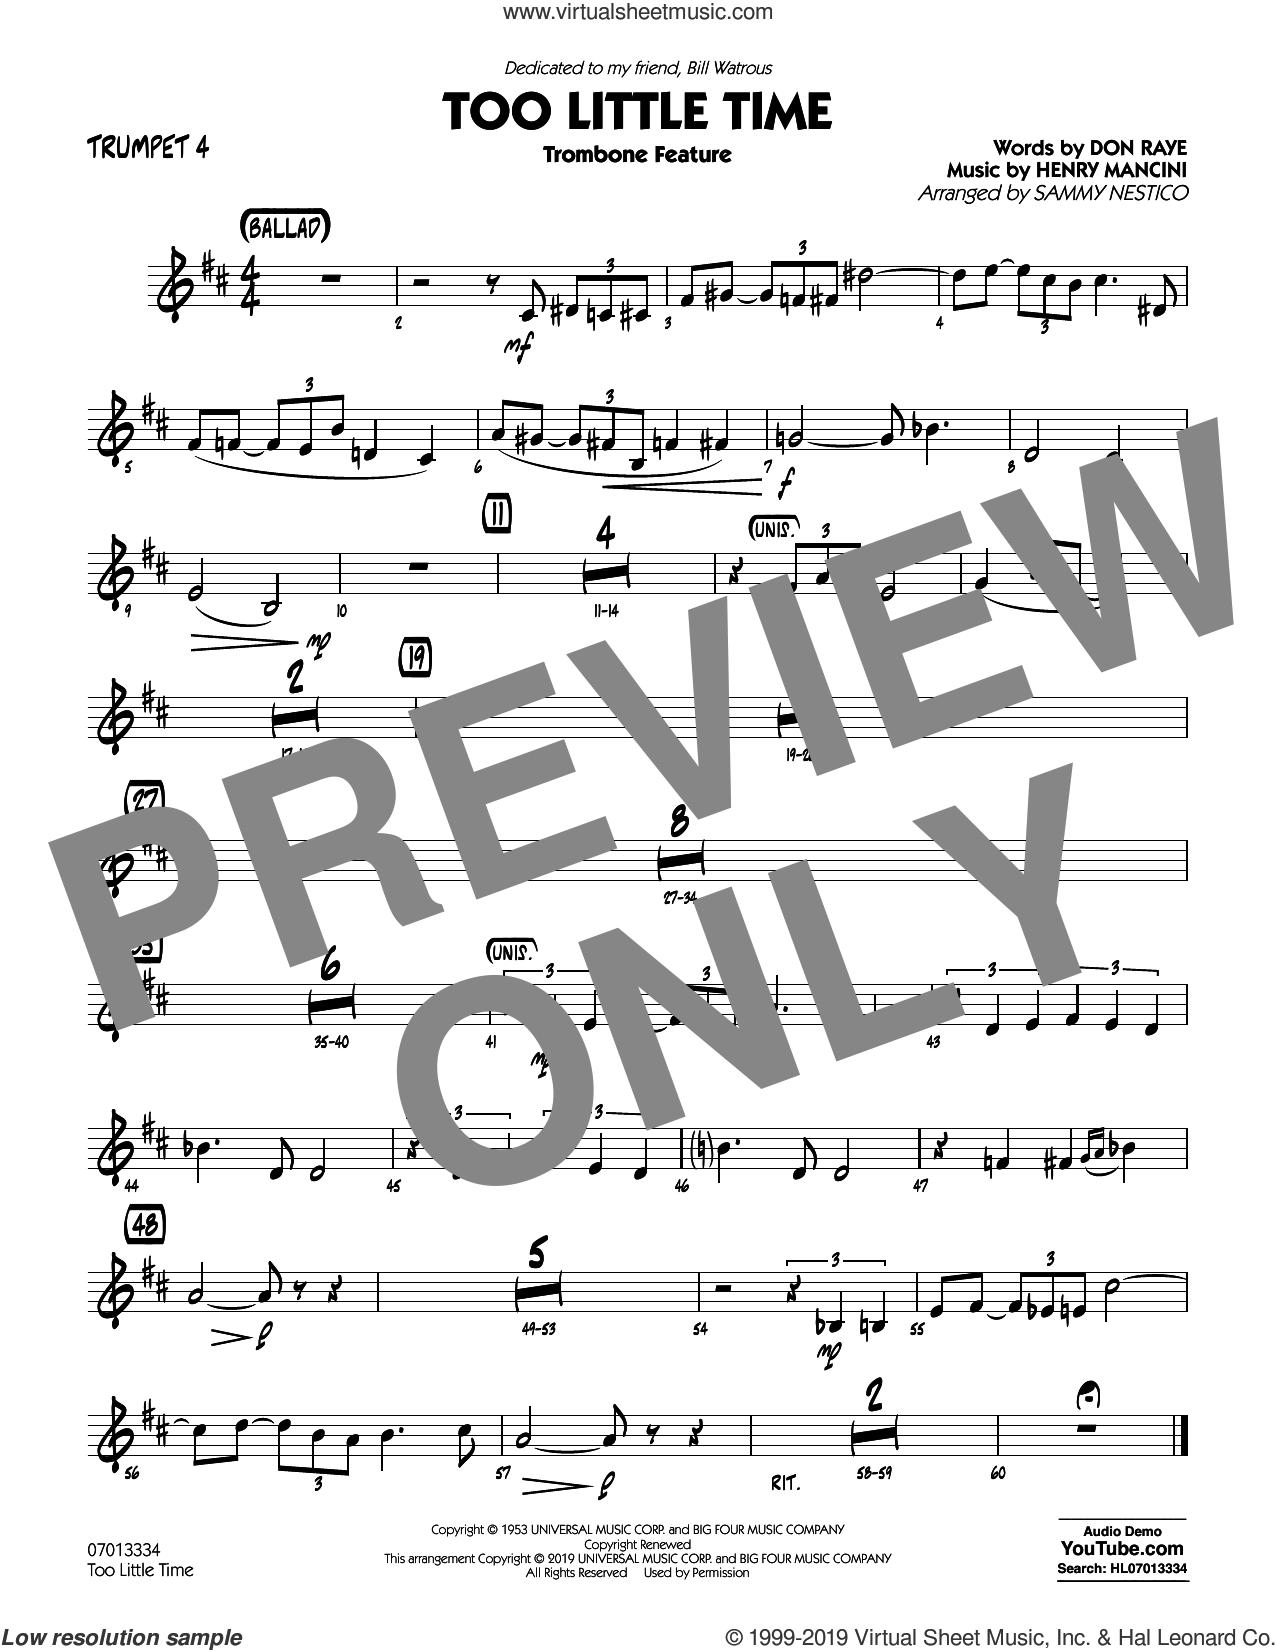 Too Little Time (arr. Sammy Nestico), conductor score (full score) sheet music for jazz band (trumpet 4) by Henry Mancini, Sammy Nestico, Bill Watrous and Don Raye, intermediate skill level